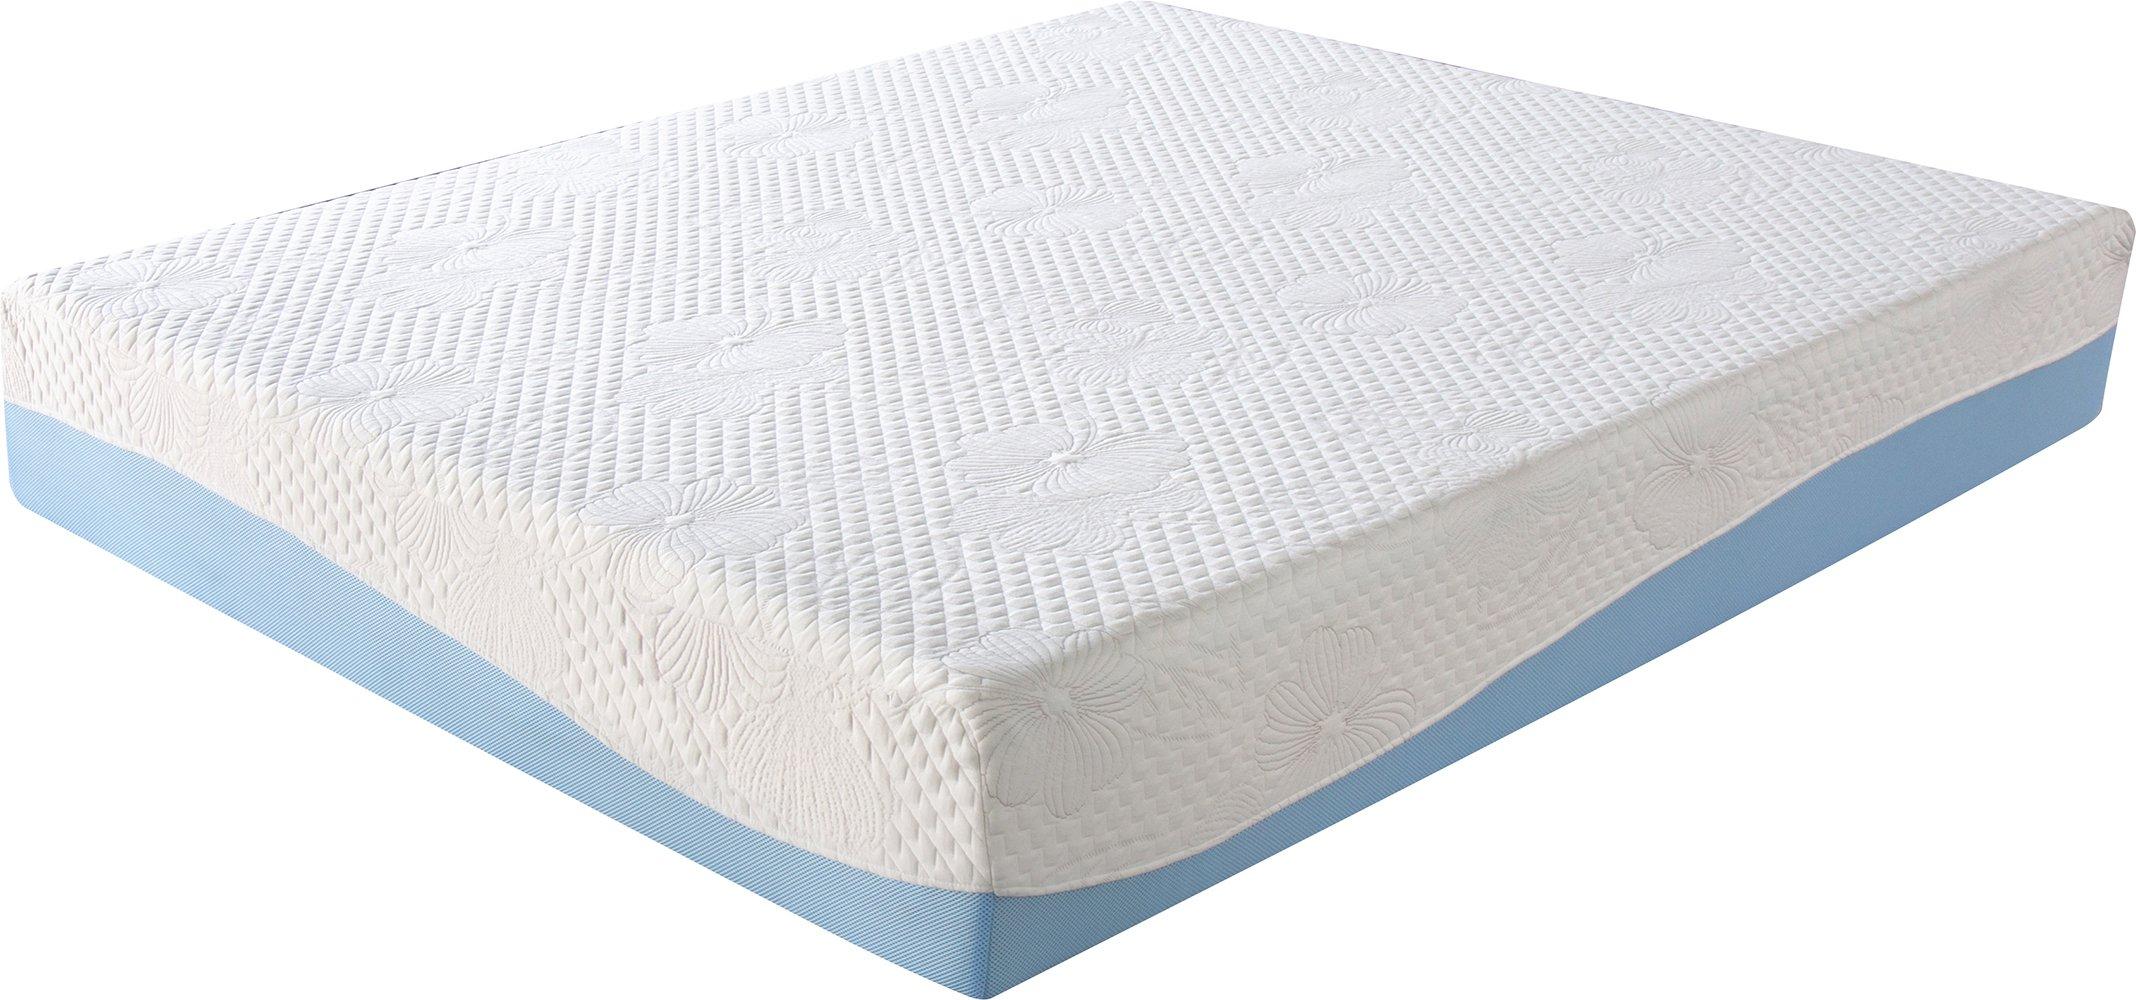 olee sleep 10 inch gel infused layer top memory foam mattress blue full ebay. Black Bedroom Furniture Sets. Home Design Ideas